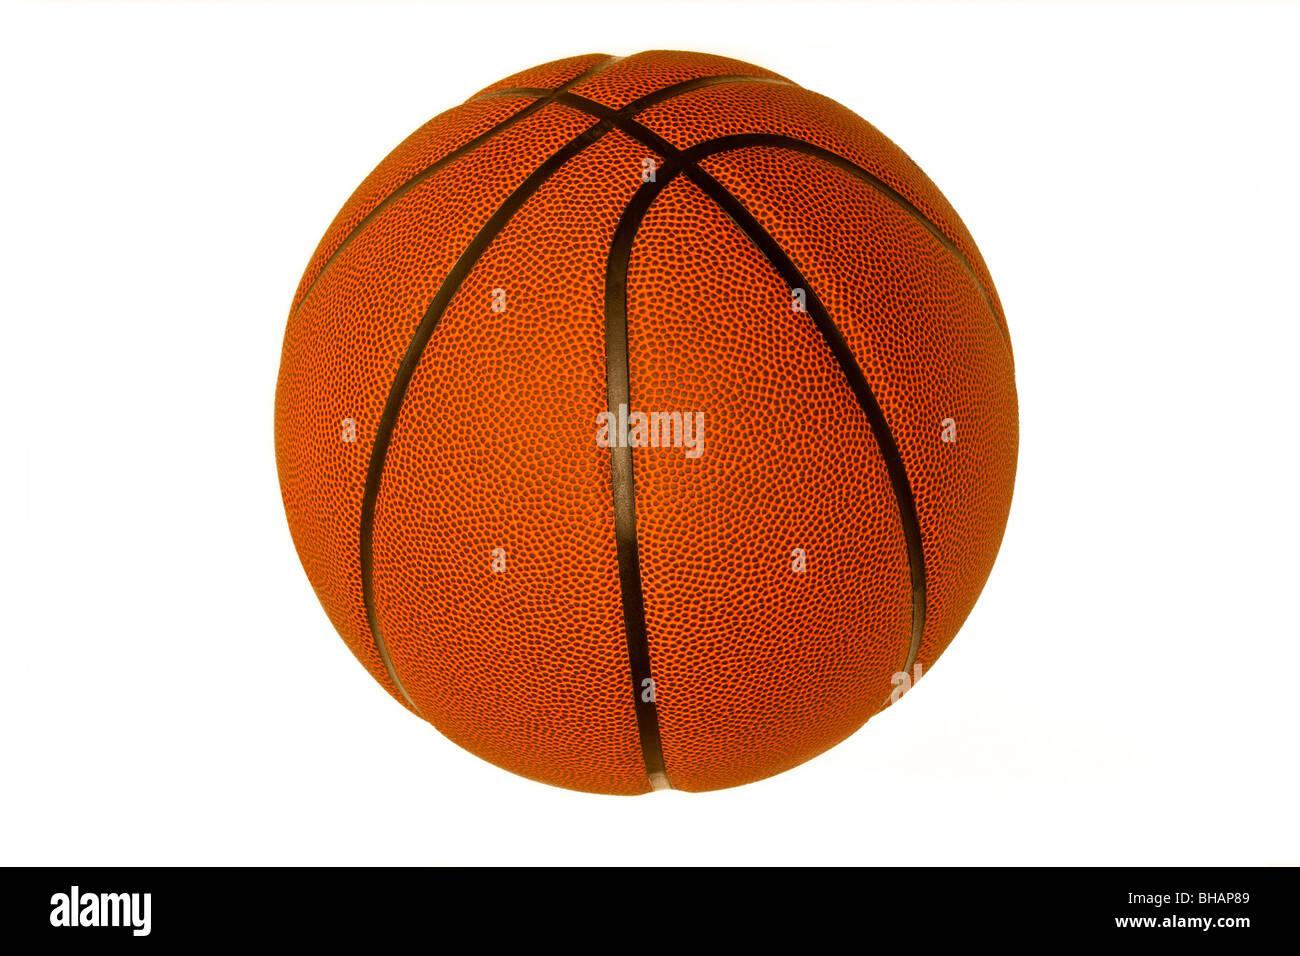 Corte de baloncesto Imagen De Stock